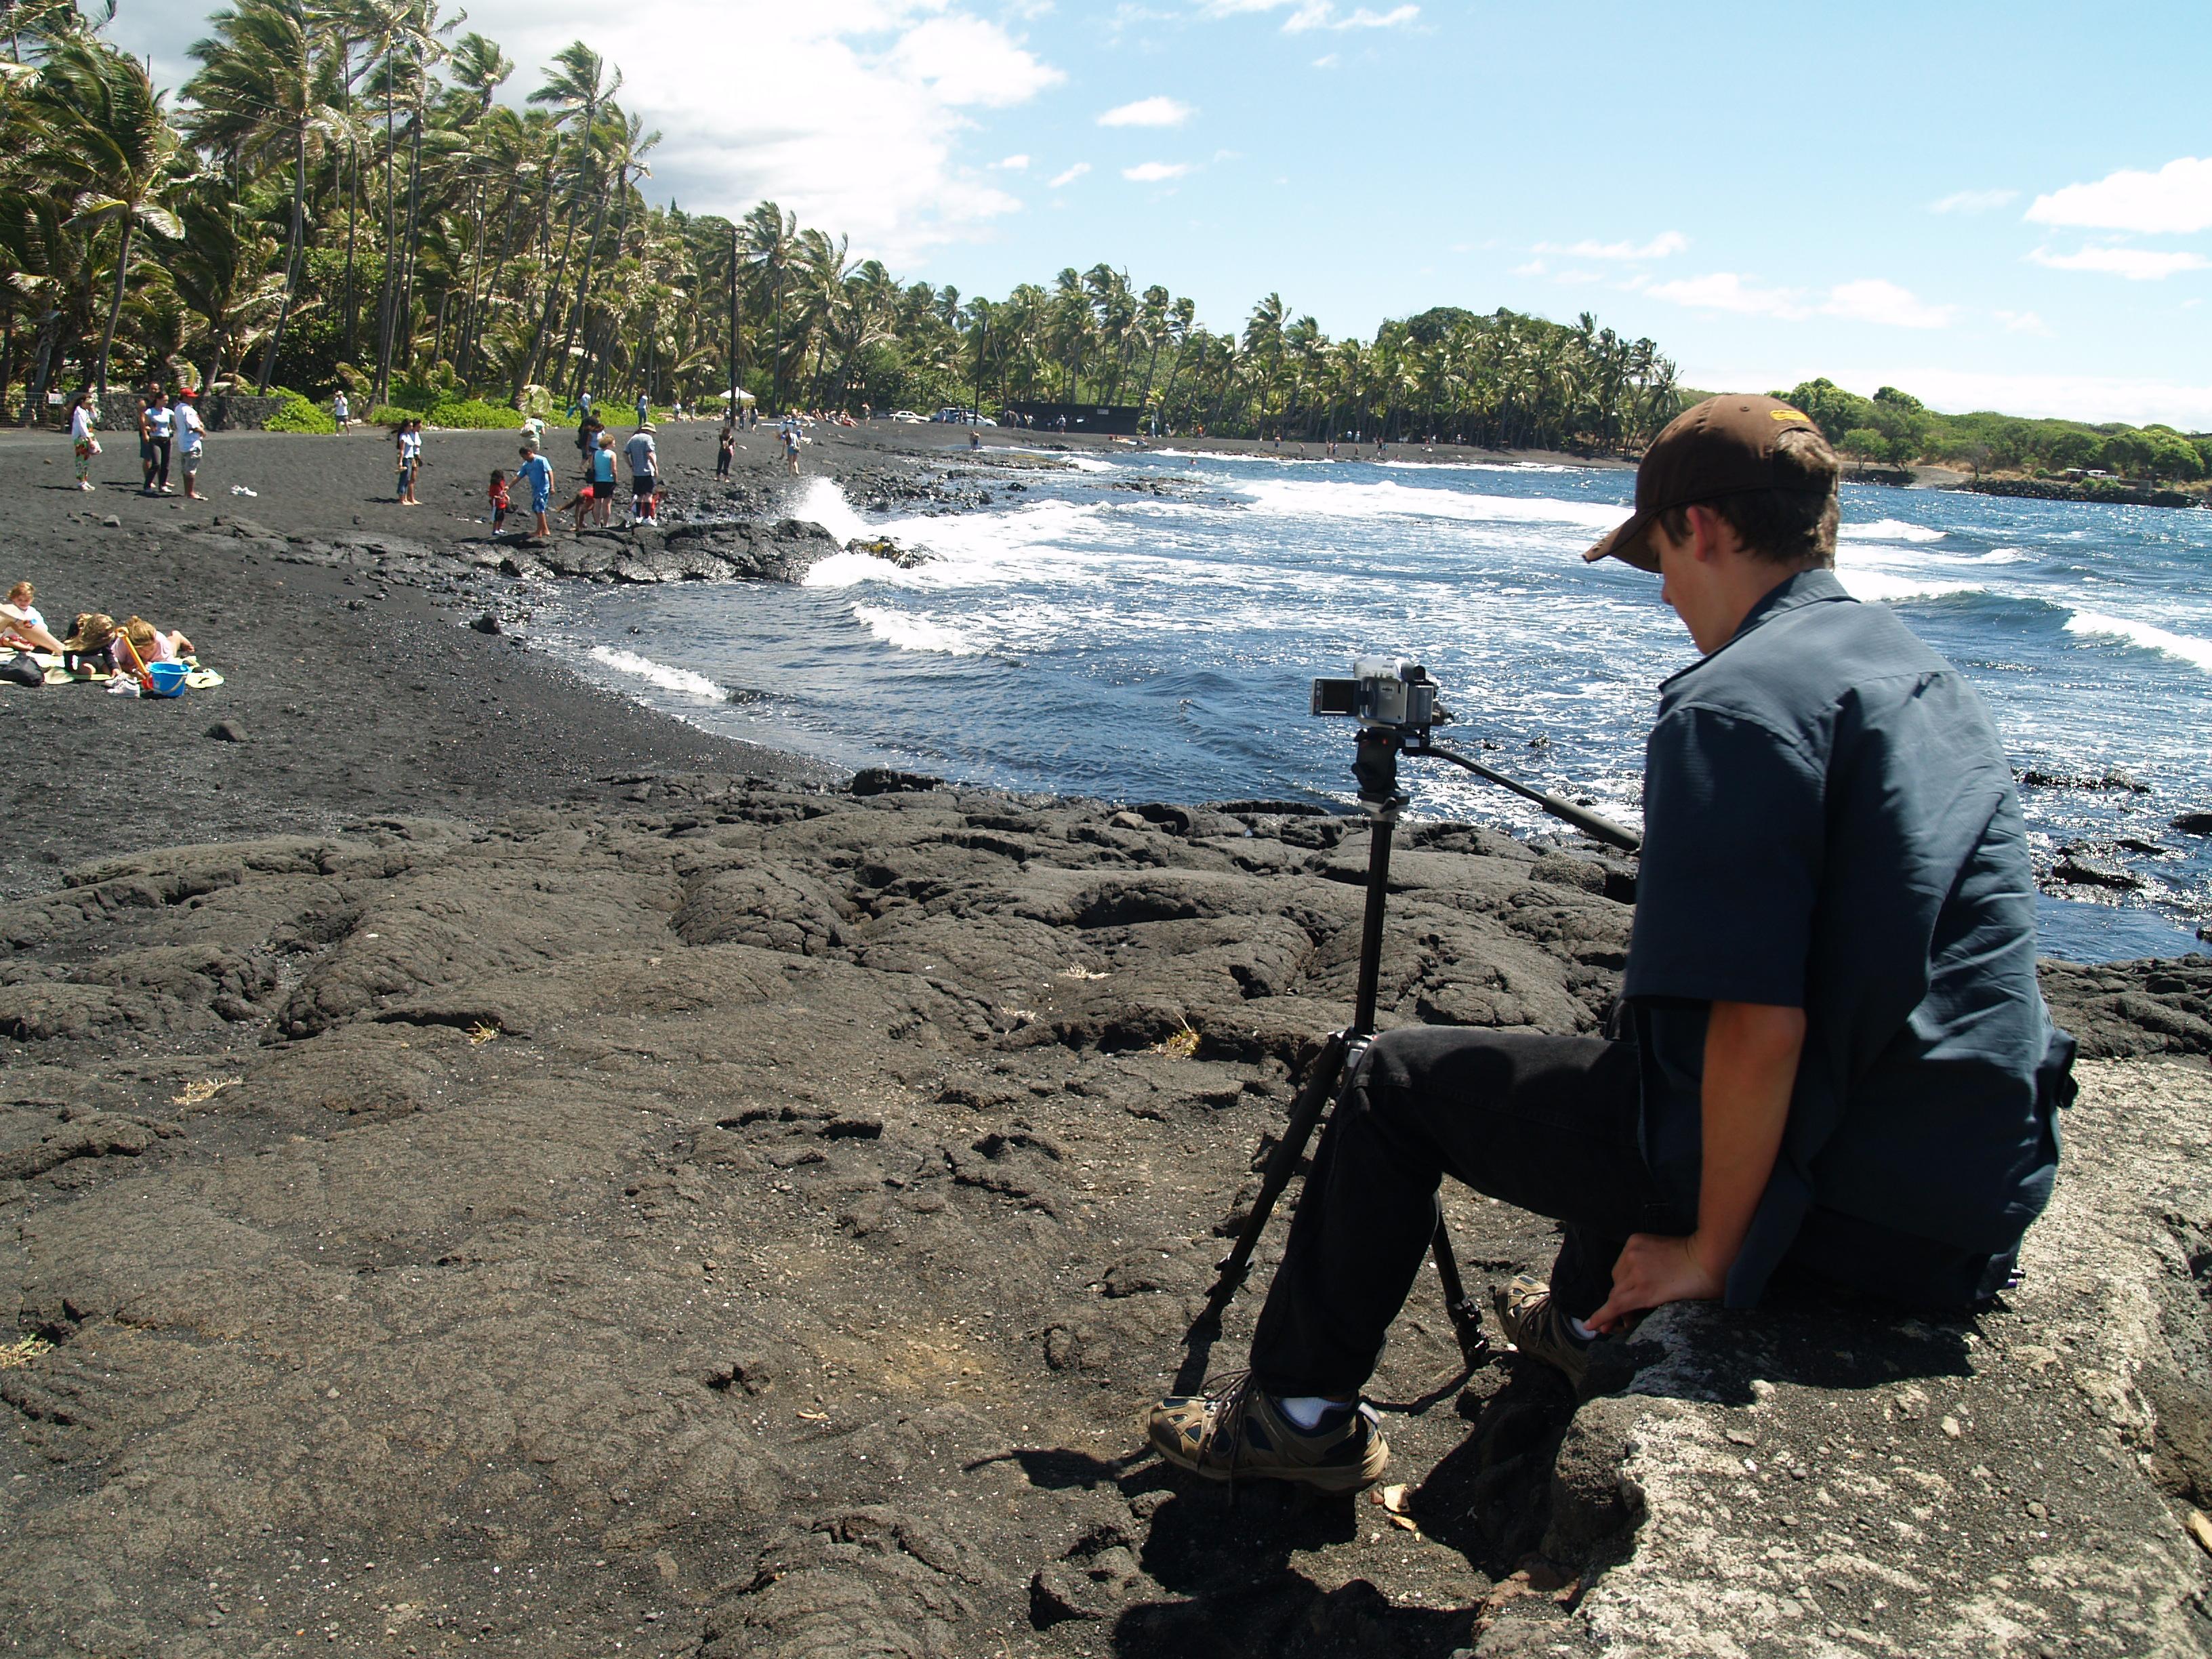 Bradford MacGowan Filming at Punalu'u Black Sand Beach, Ka'u Hawaii: Photo by Donald MacGowan